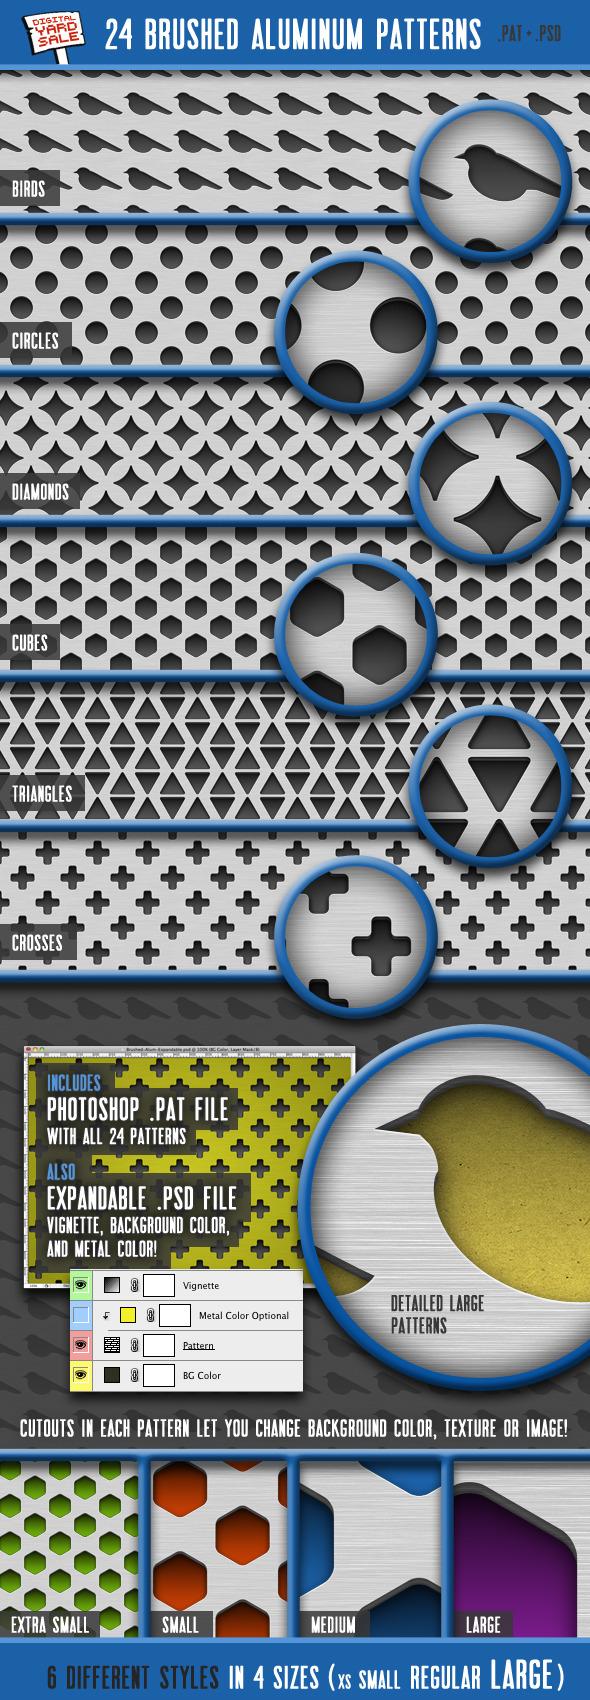 24 Brushed Aluminum Patterns - Techno / Futuristic Textures / Fills / Patterns